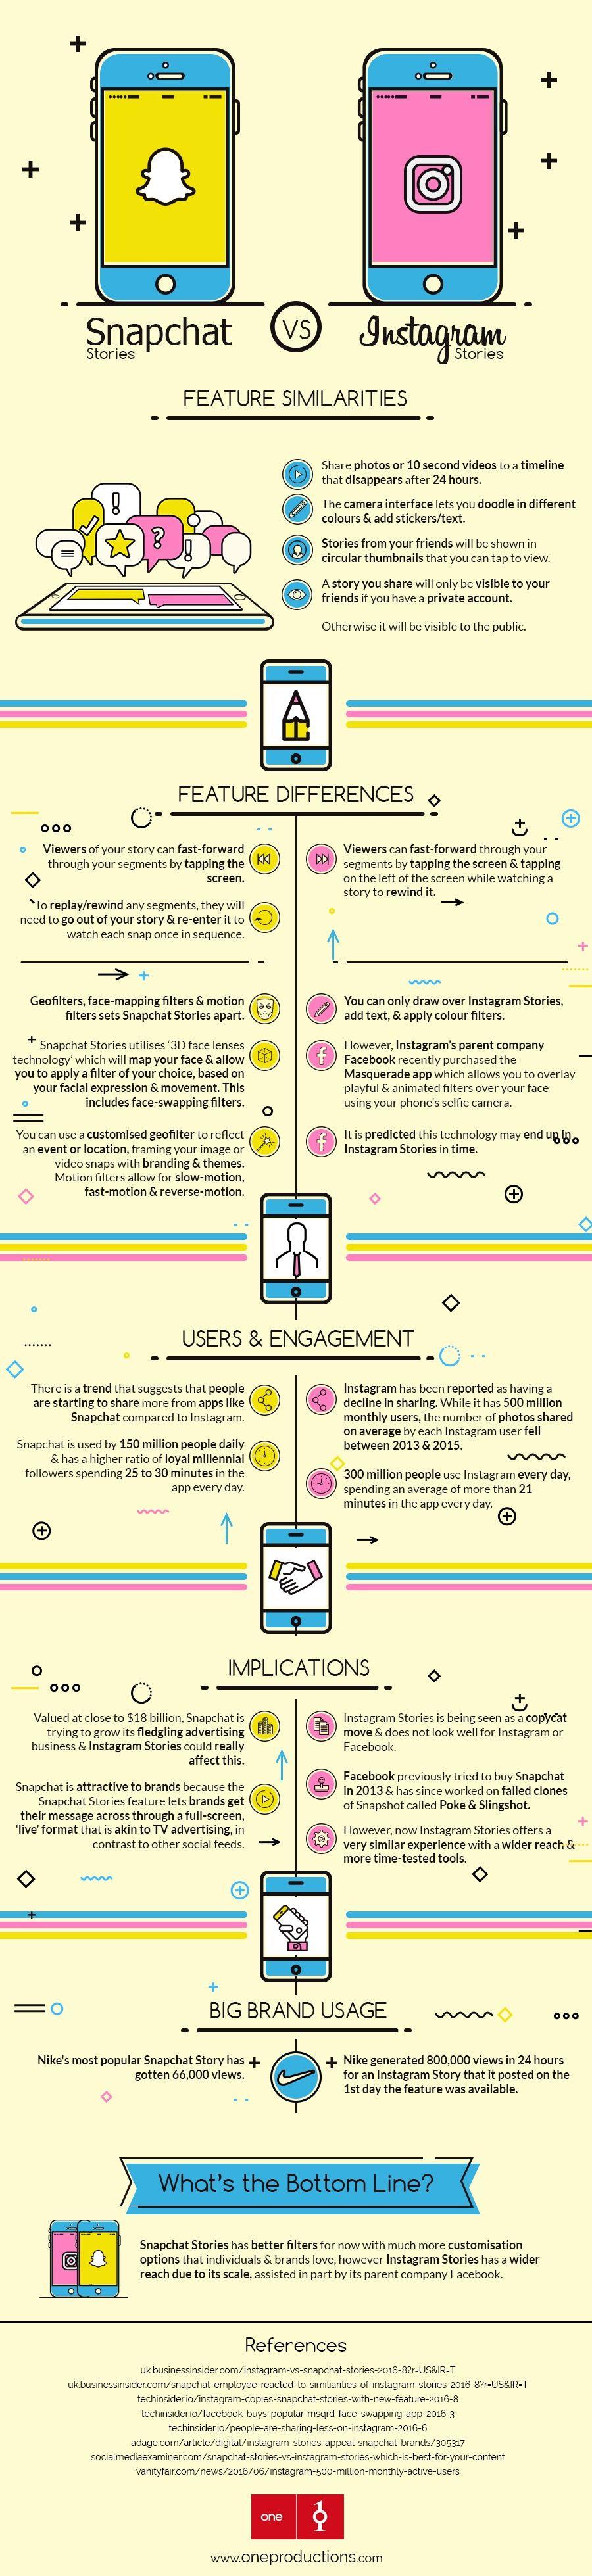 Snapchat Stories vs Instagram Stories [Infographic] | Social Media Today